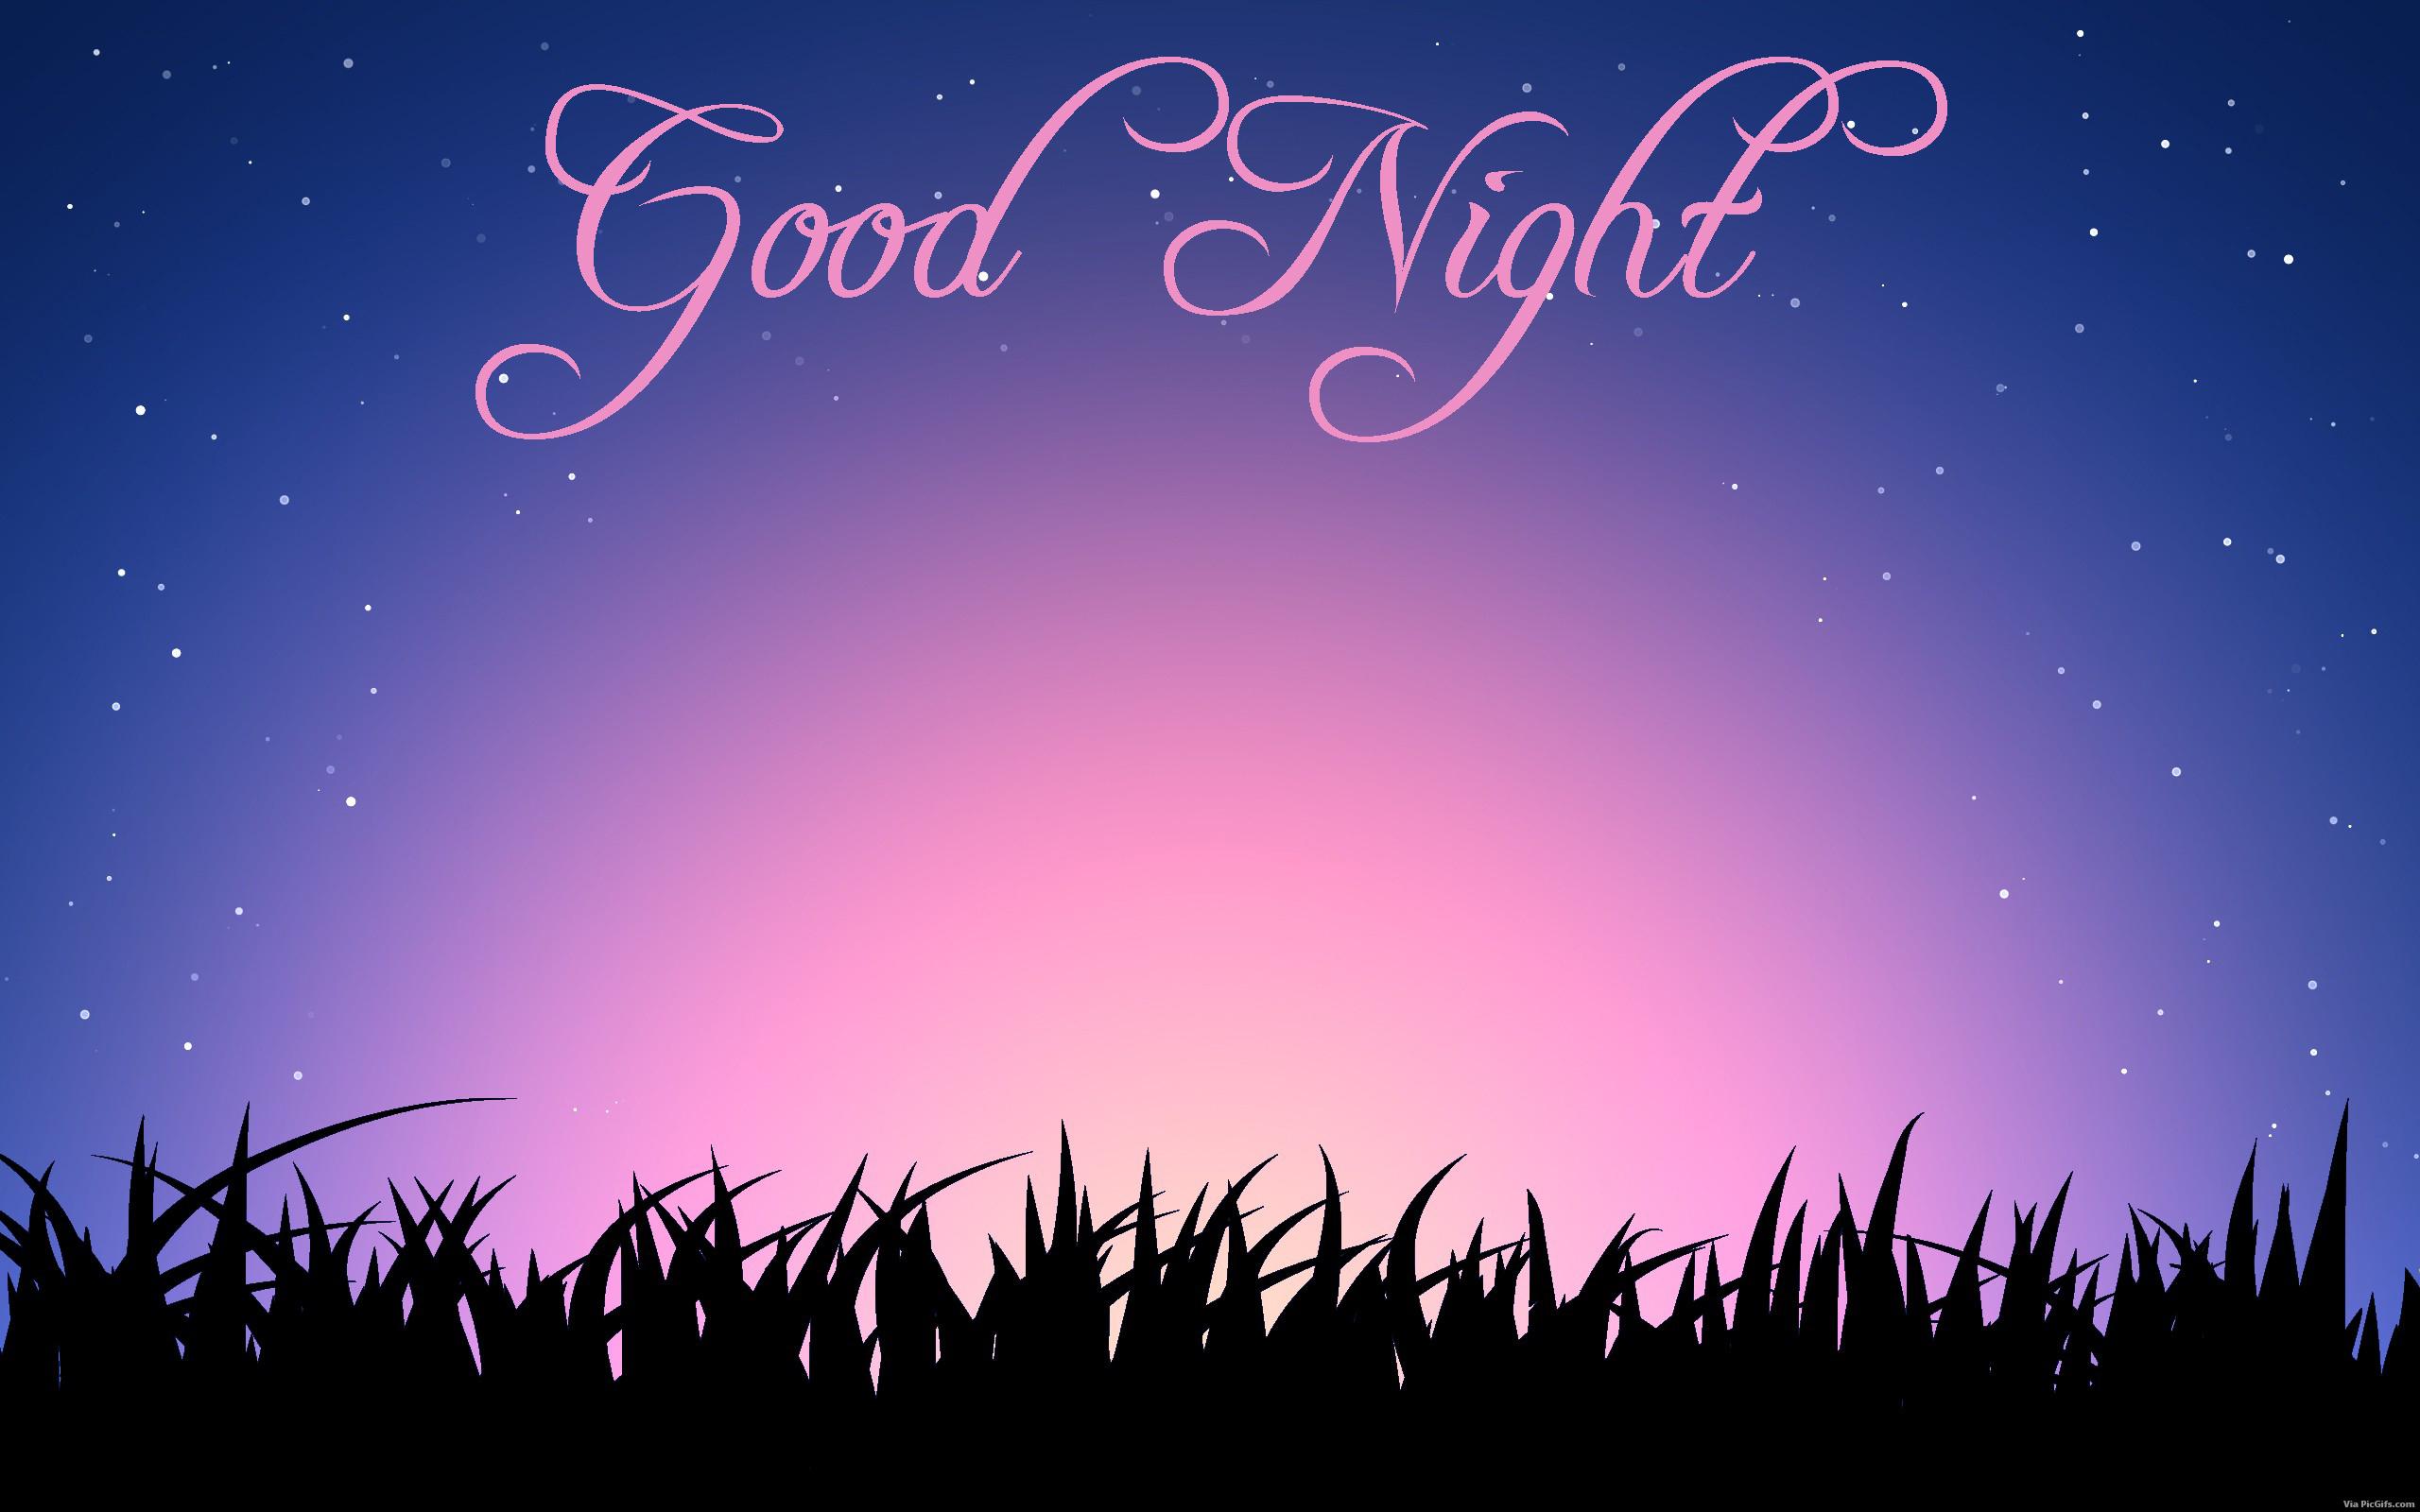 Good night facebook graphics